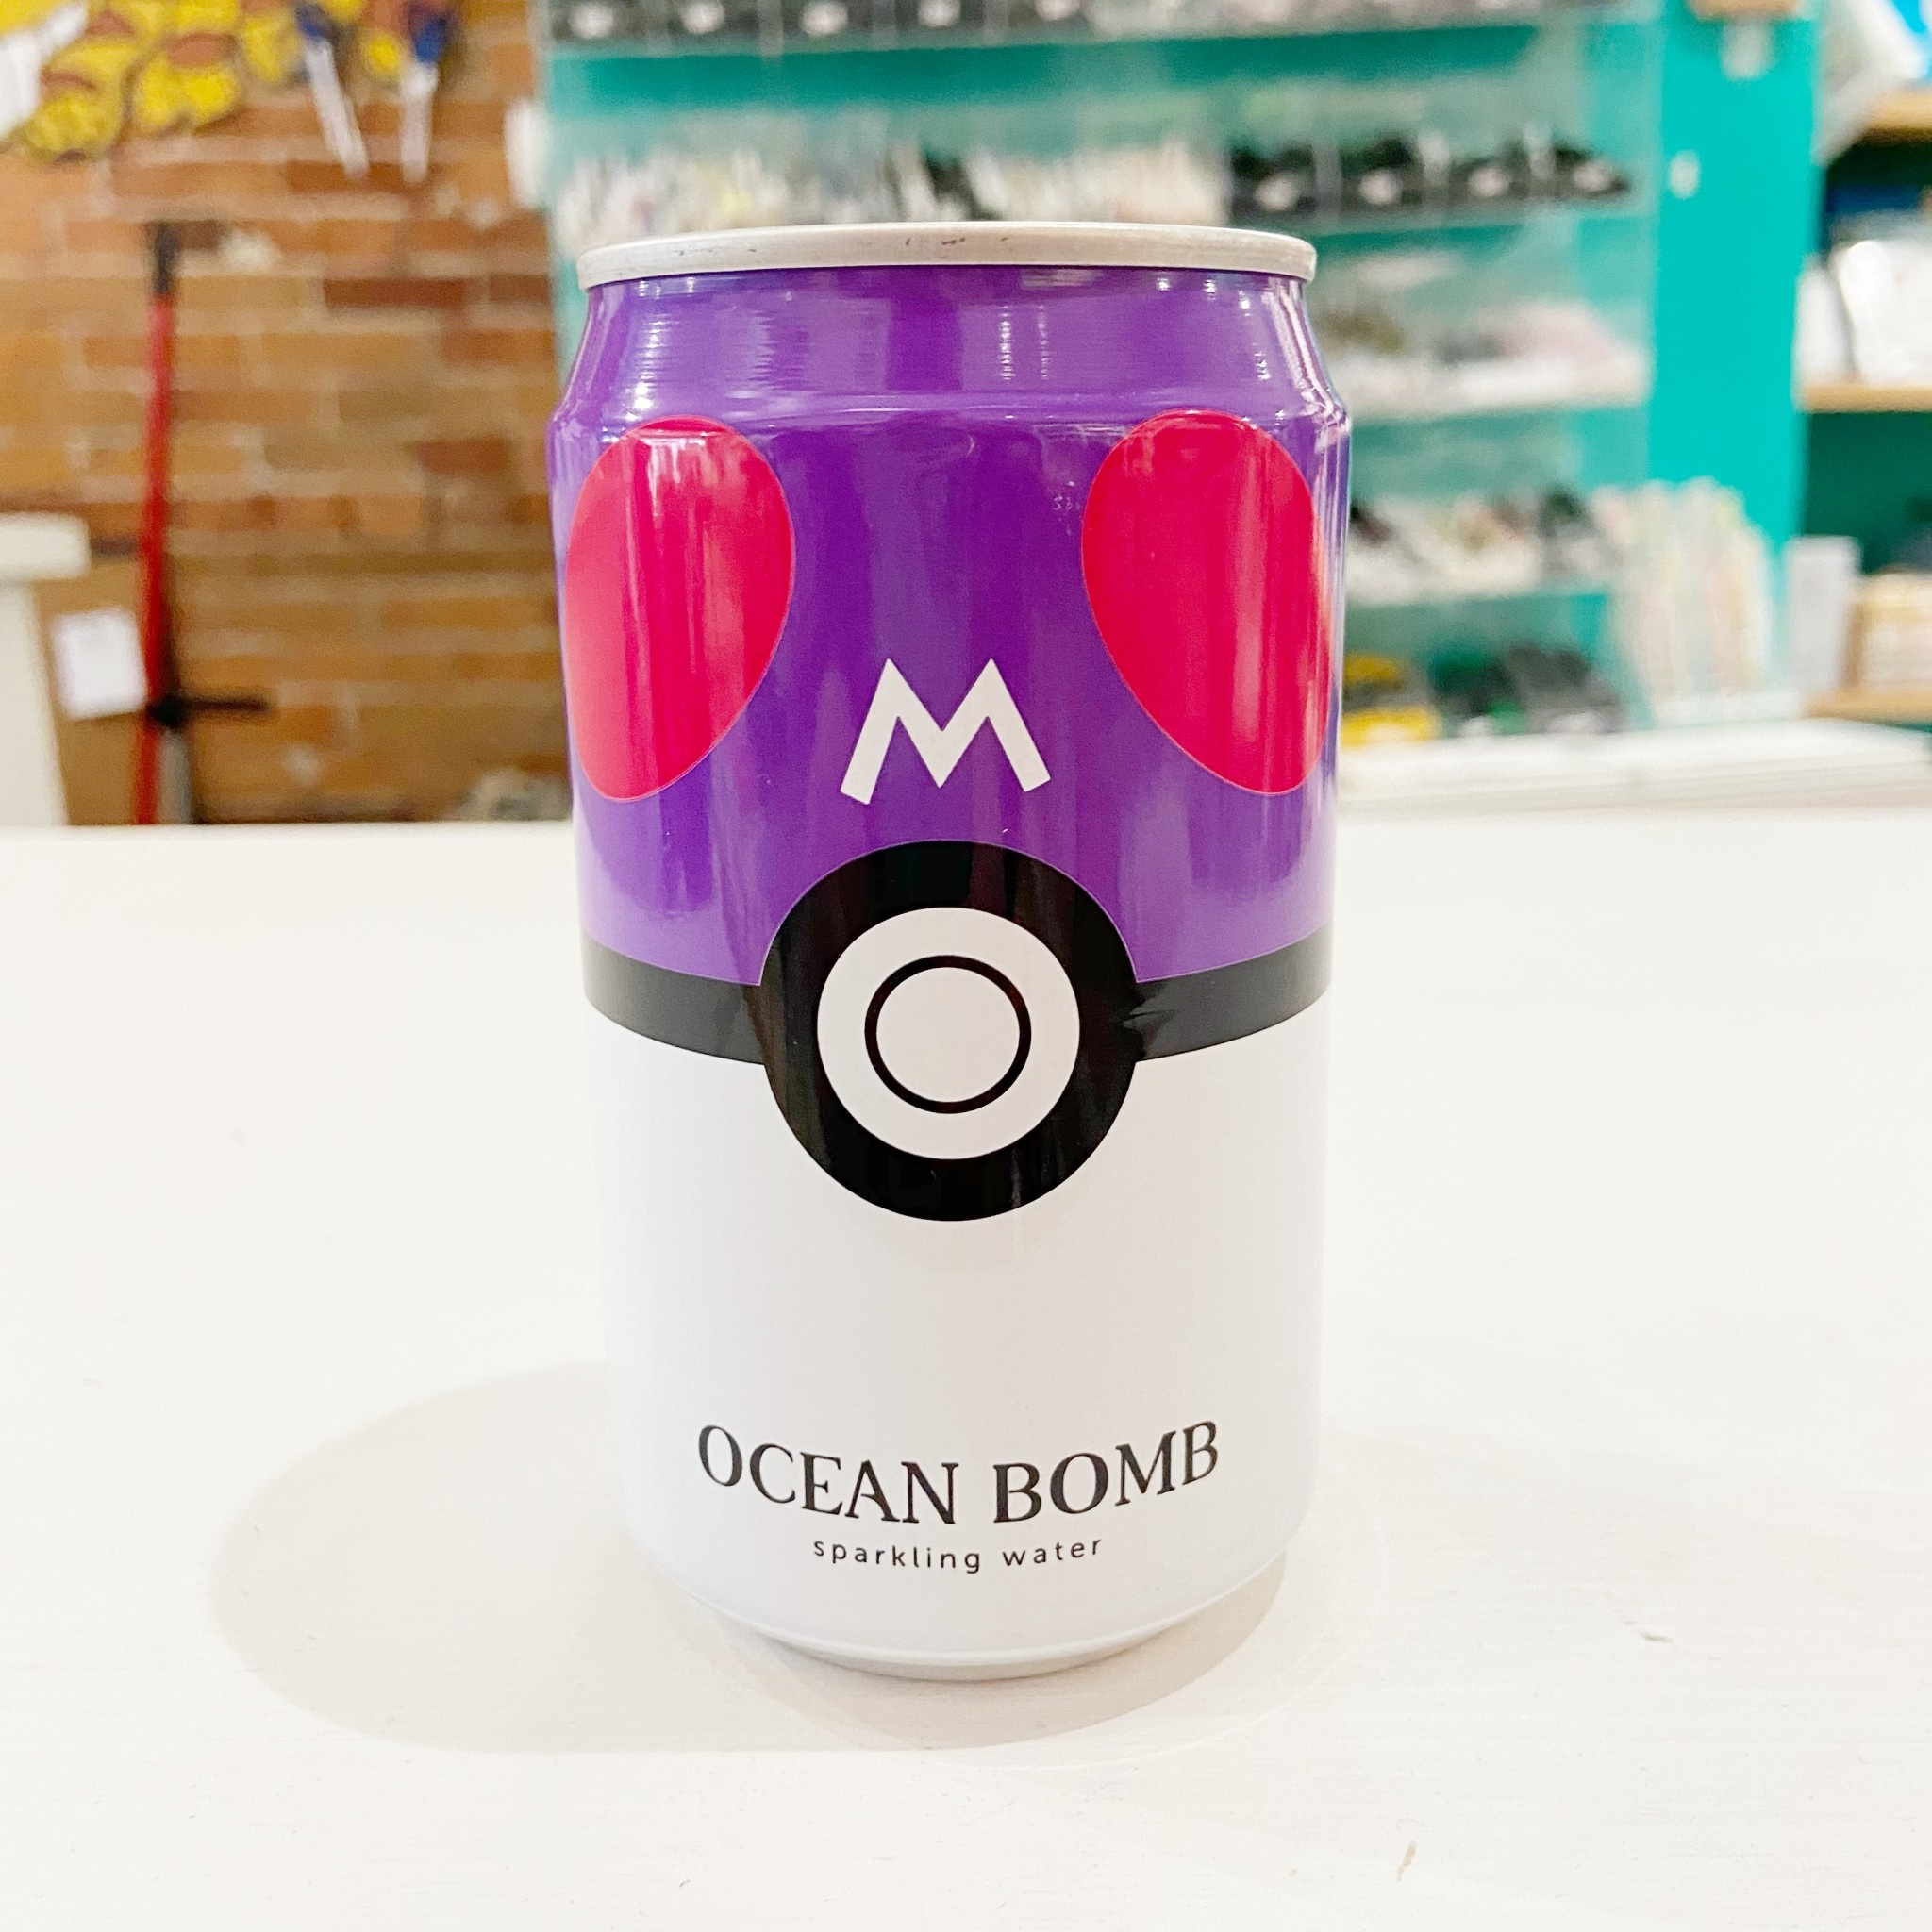 Ocean Bomb Original Sparkling Water Masterball